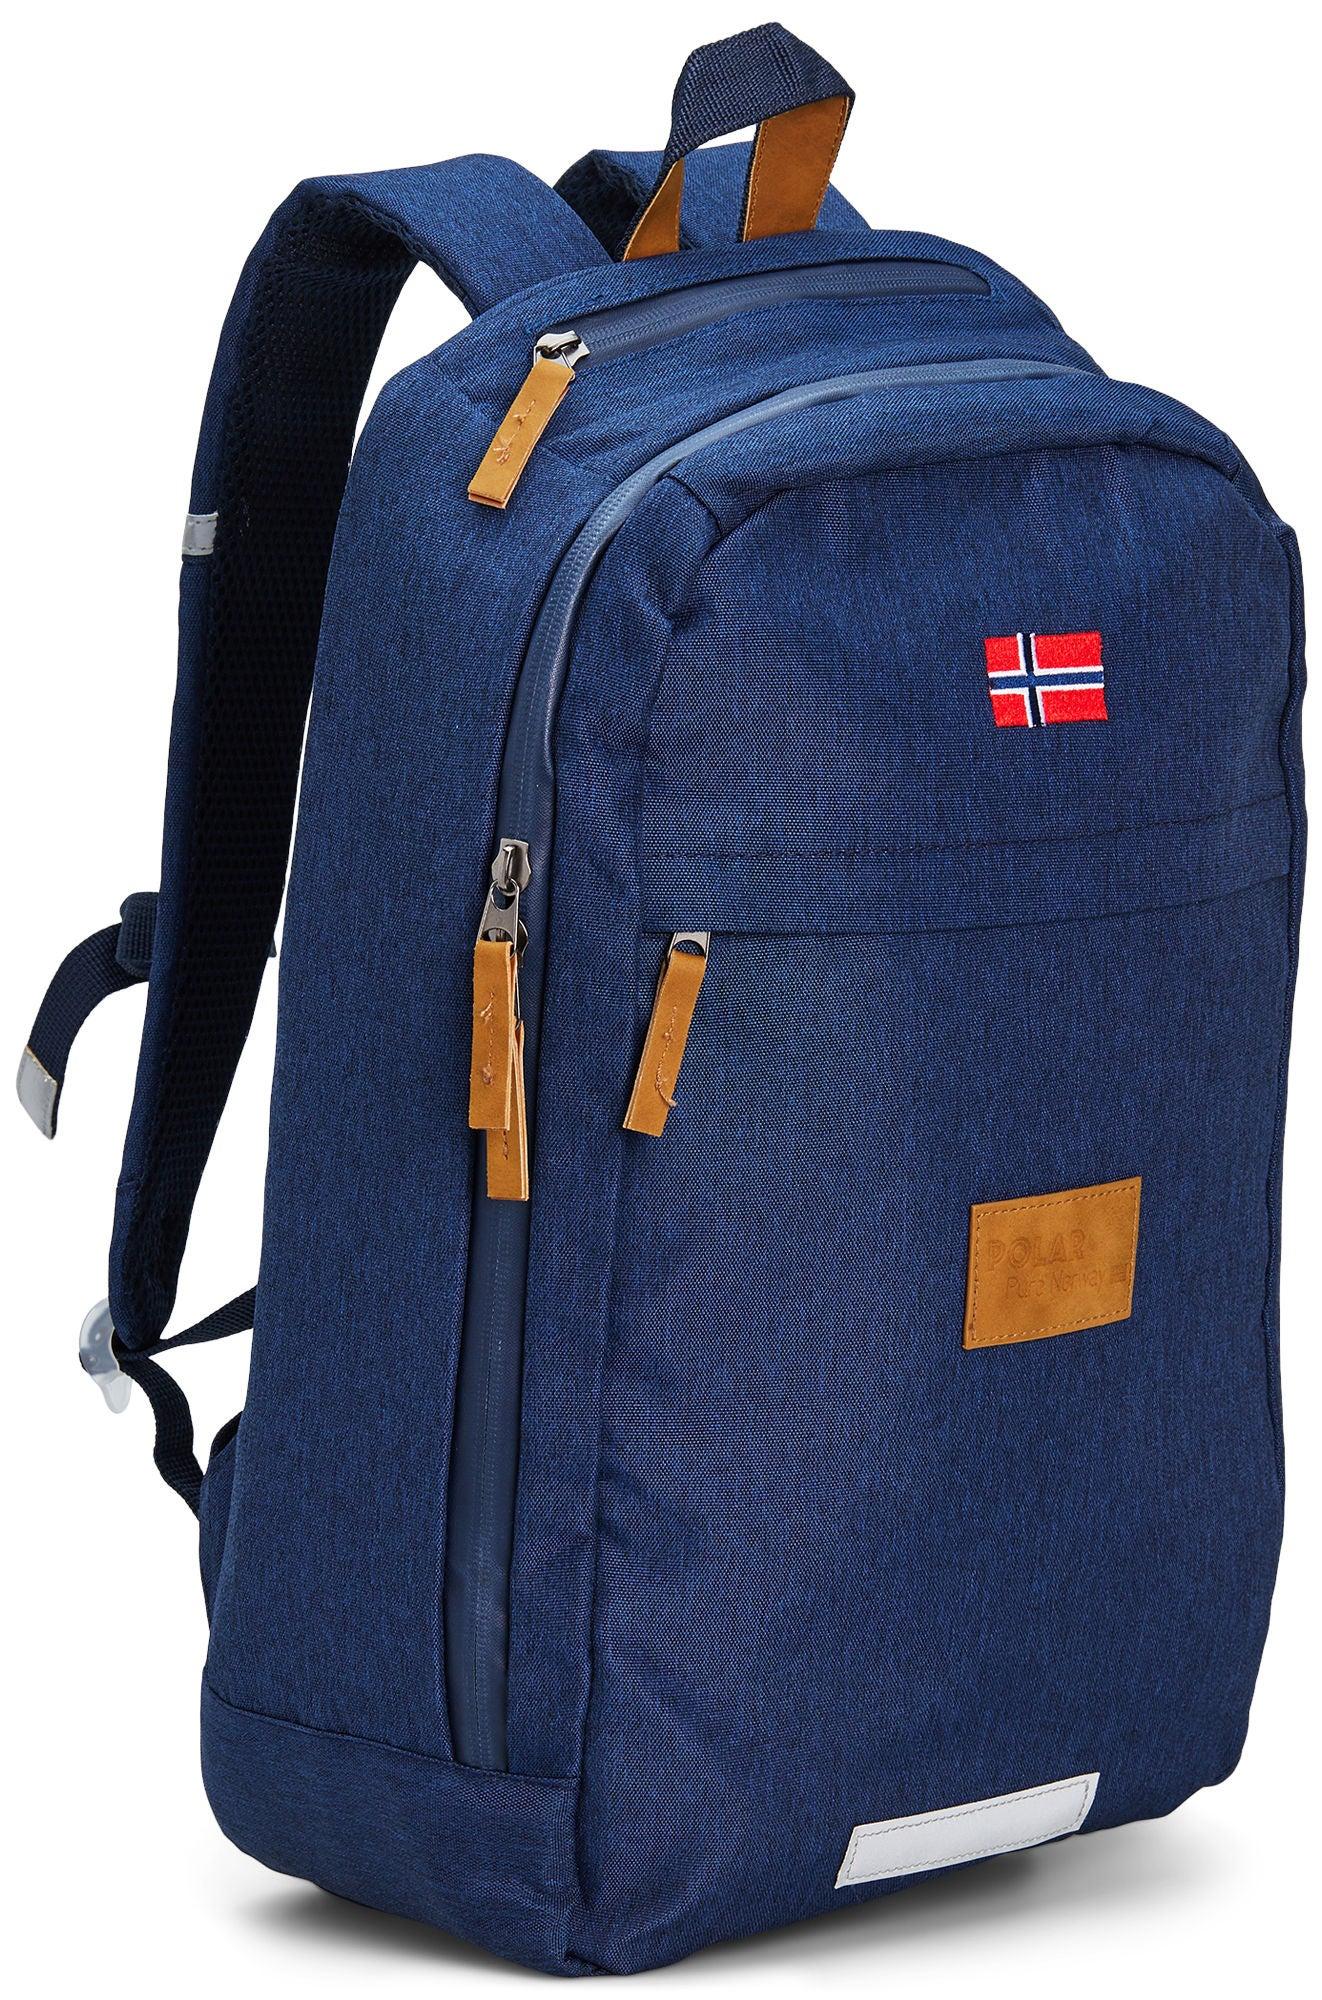 Pure Norway Polar Ryggsäck 29L, Mörkblå